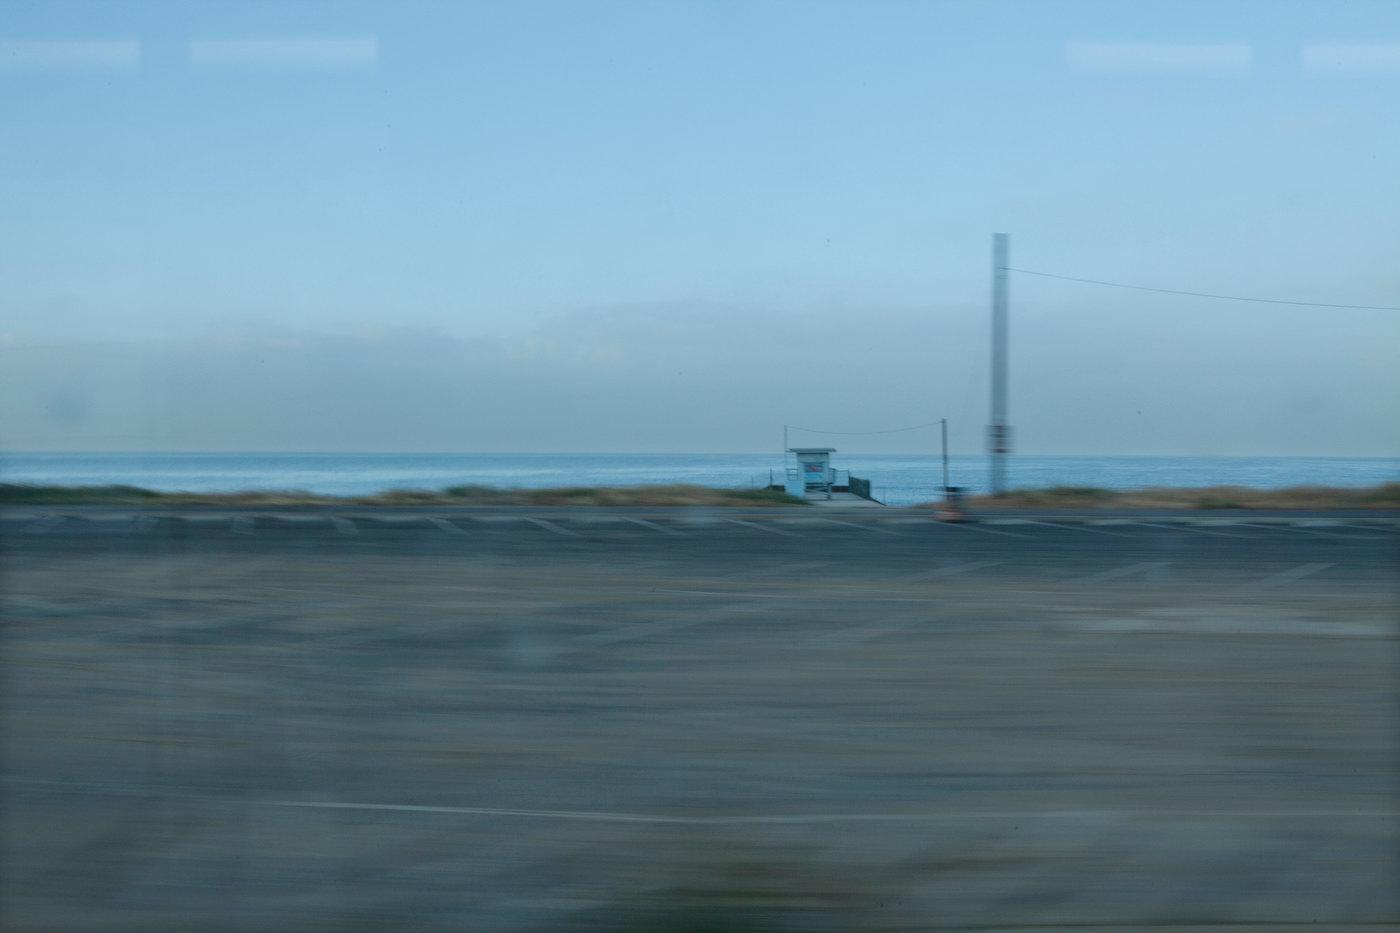 Pacific Coast Highway at dawn, Malibu (for M Magazine).